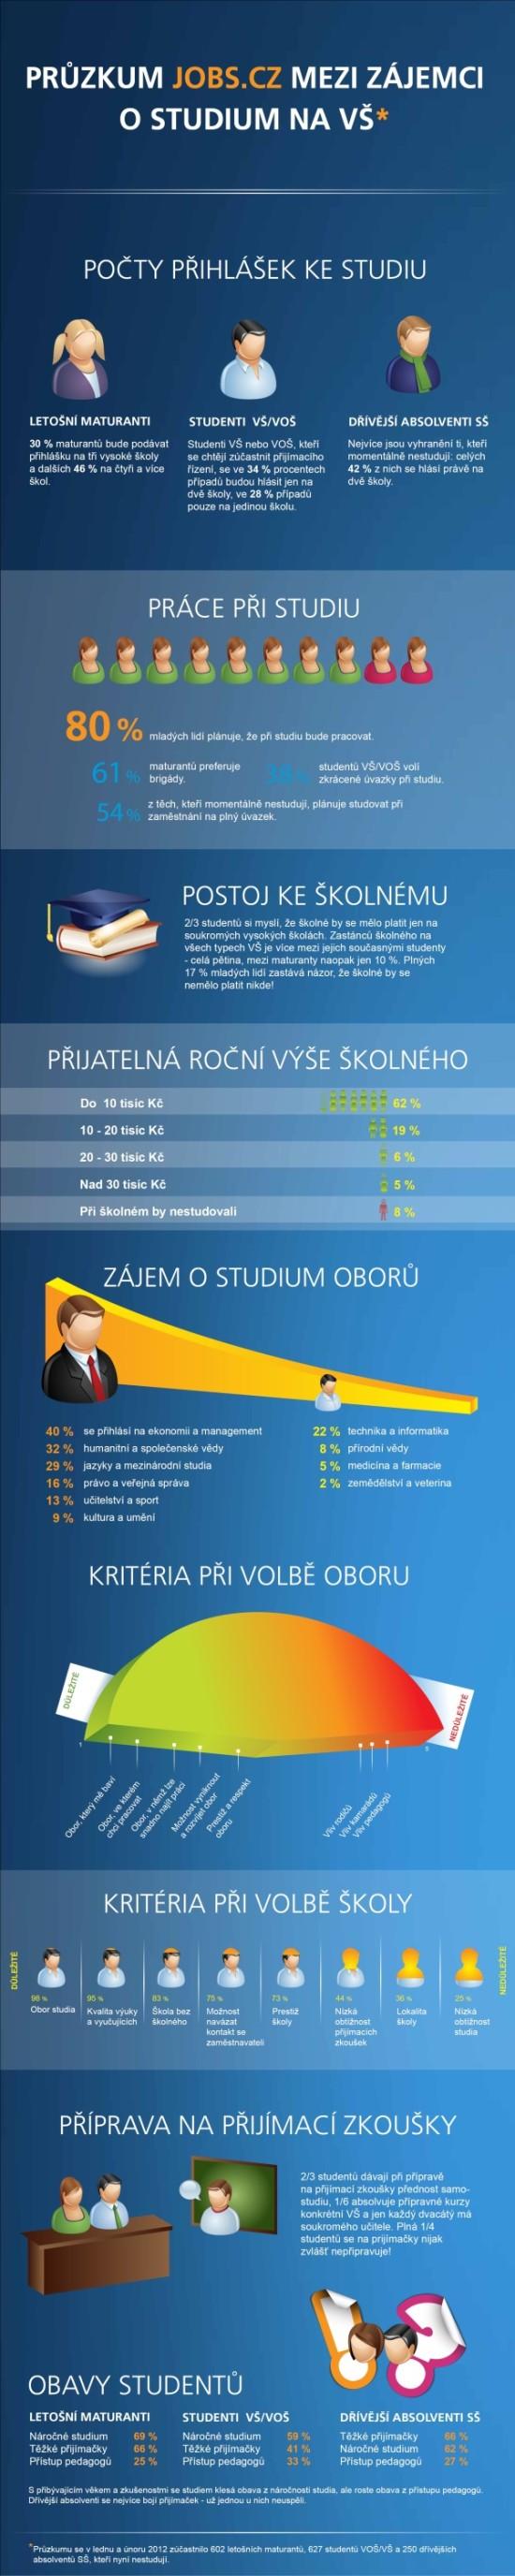 Průzkum mezi zájemci o studium VS - infografika